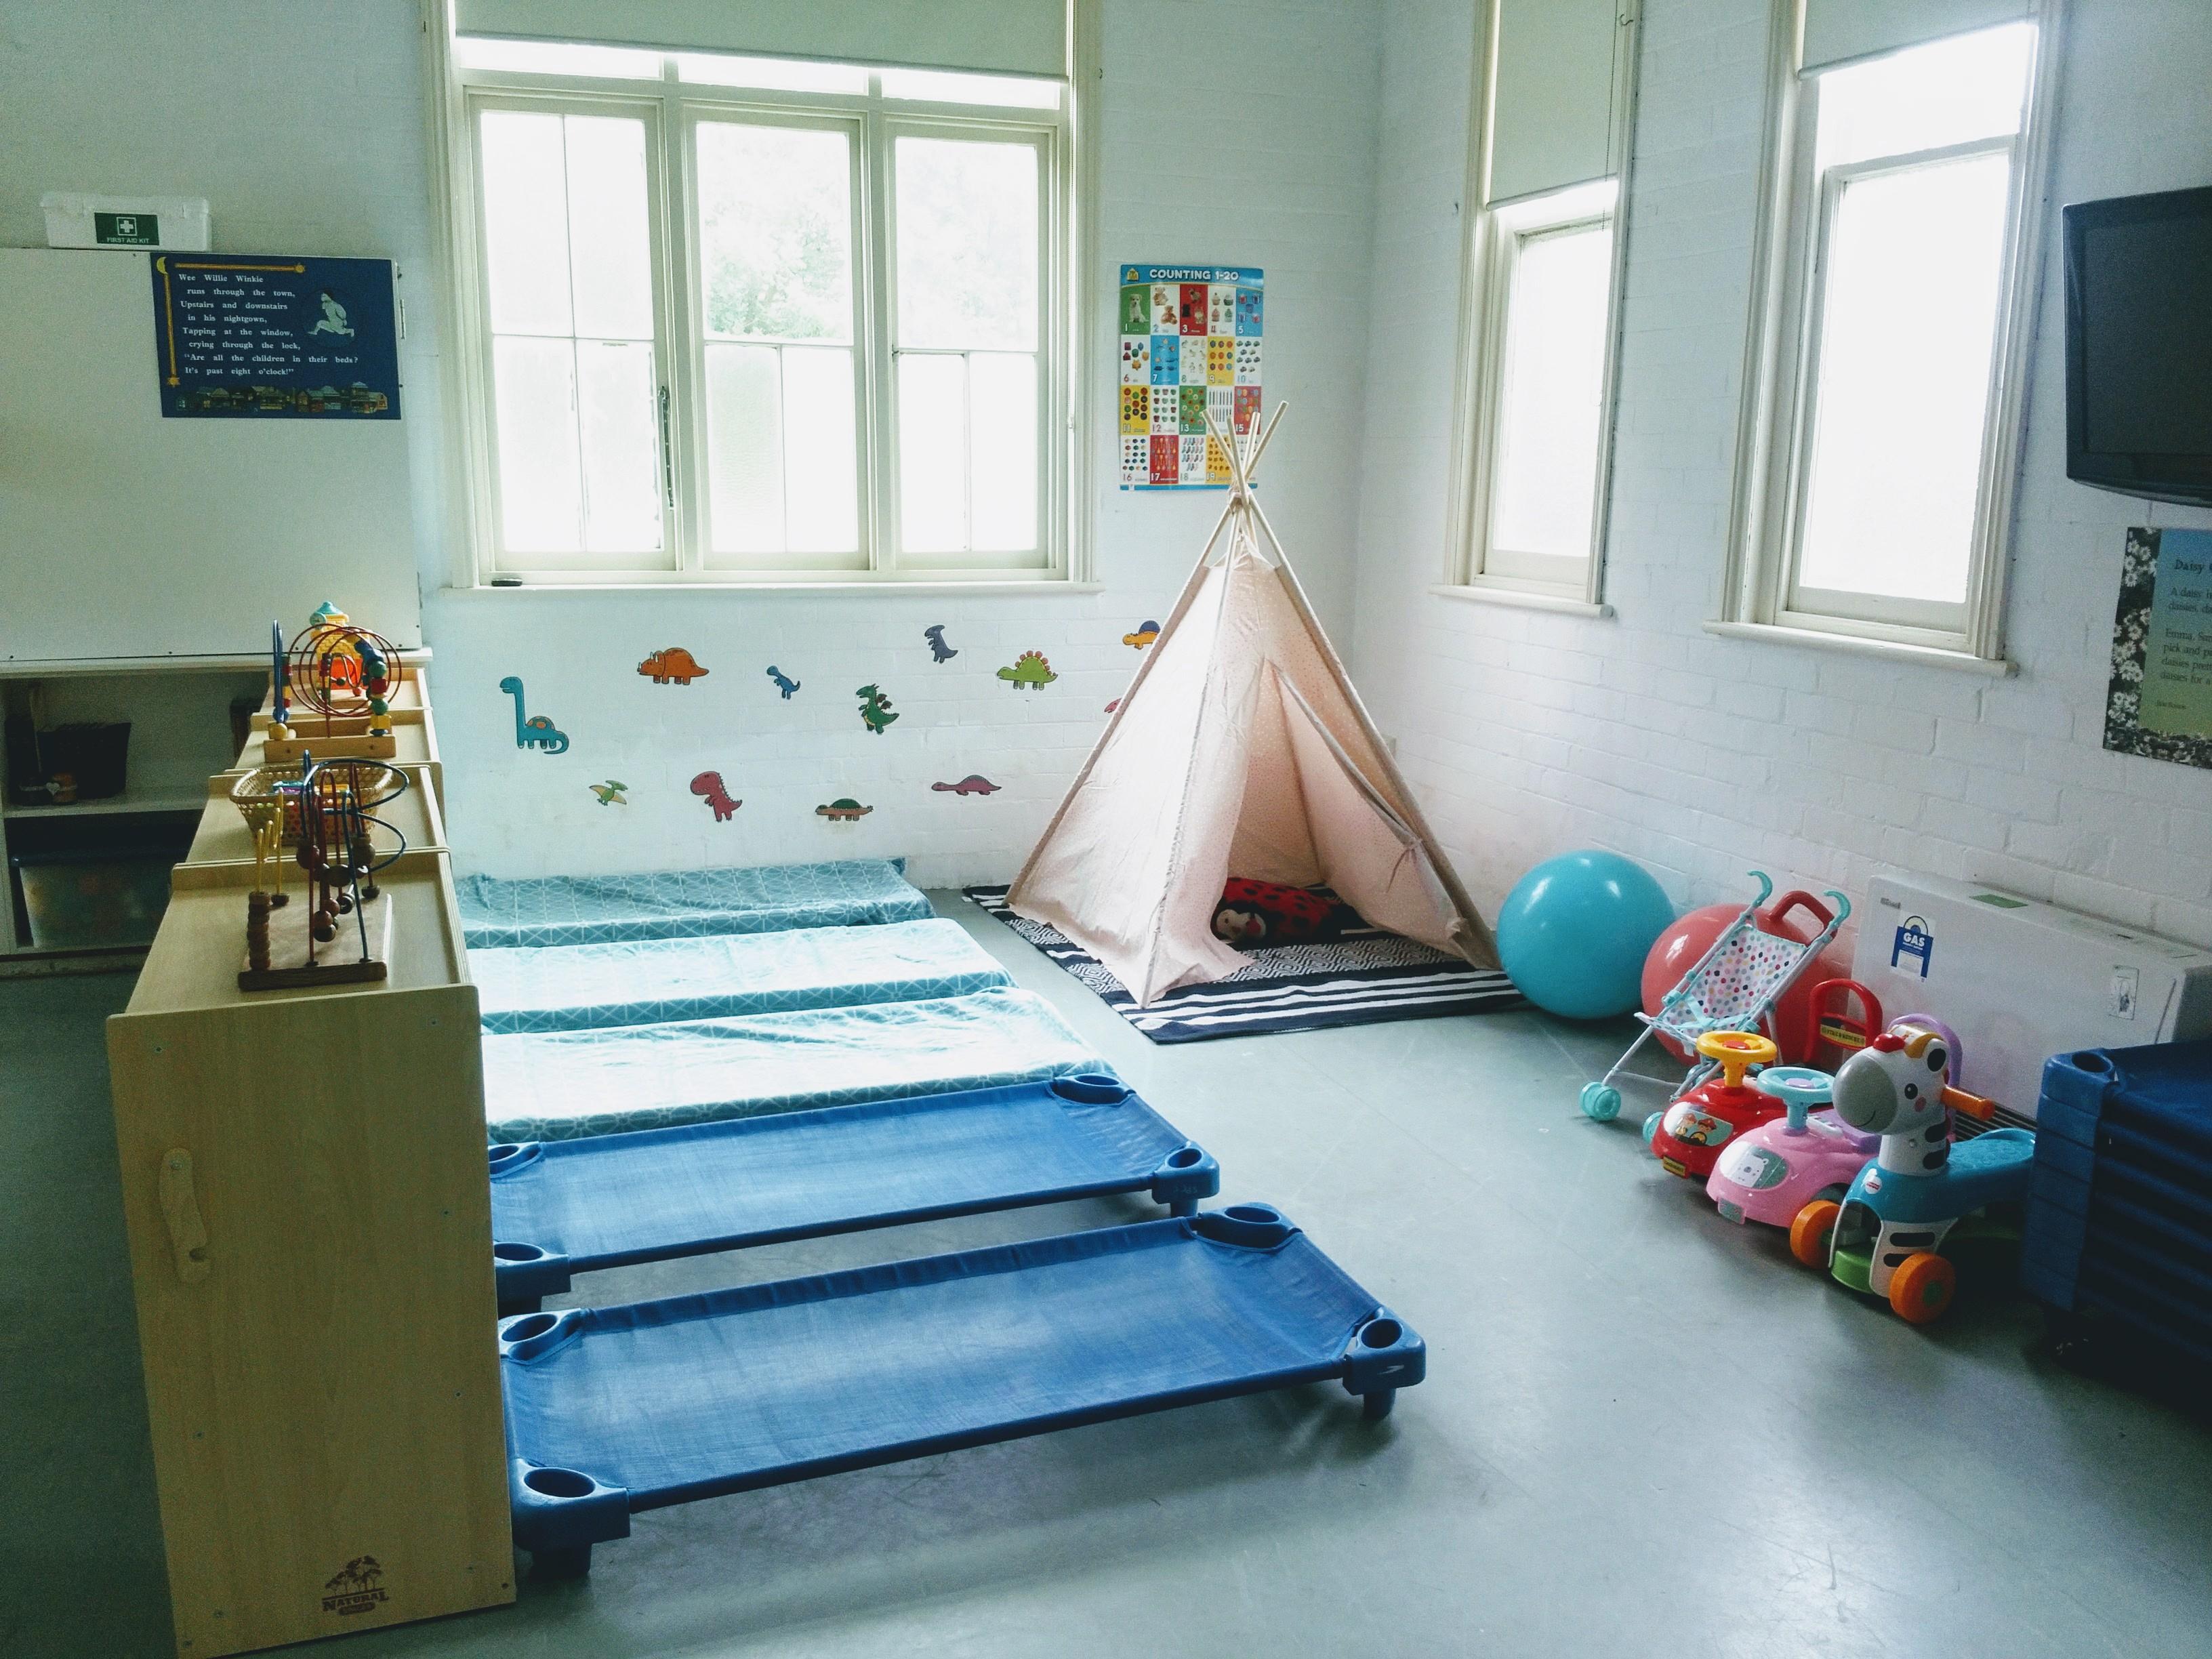 St Pauls Childcare Centre1